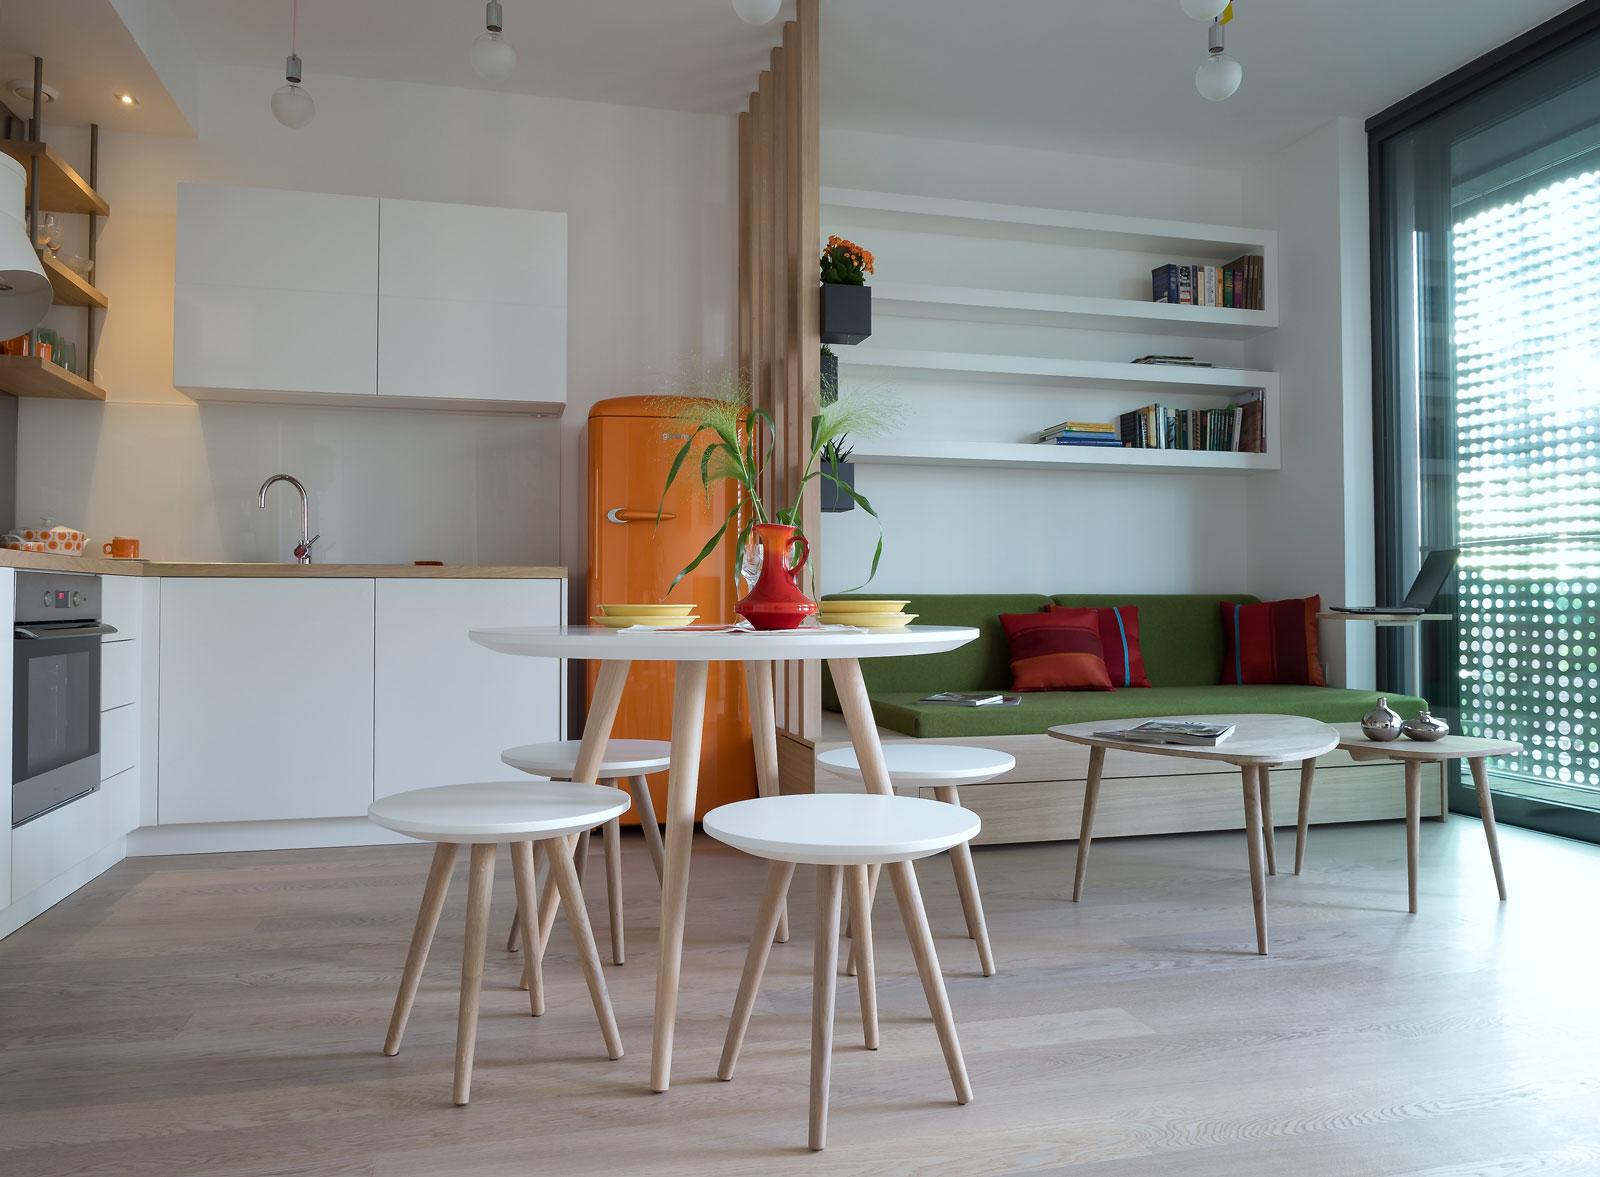 Apartment in Ljubljana by GAO architects-14